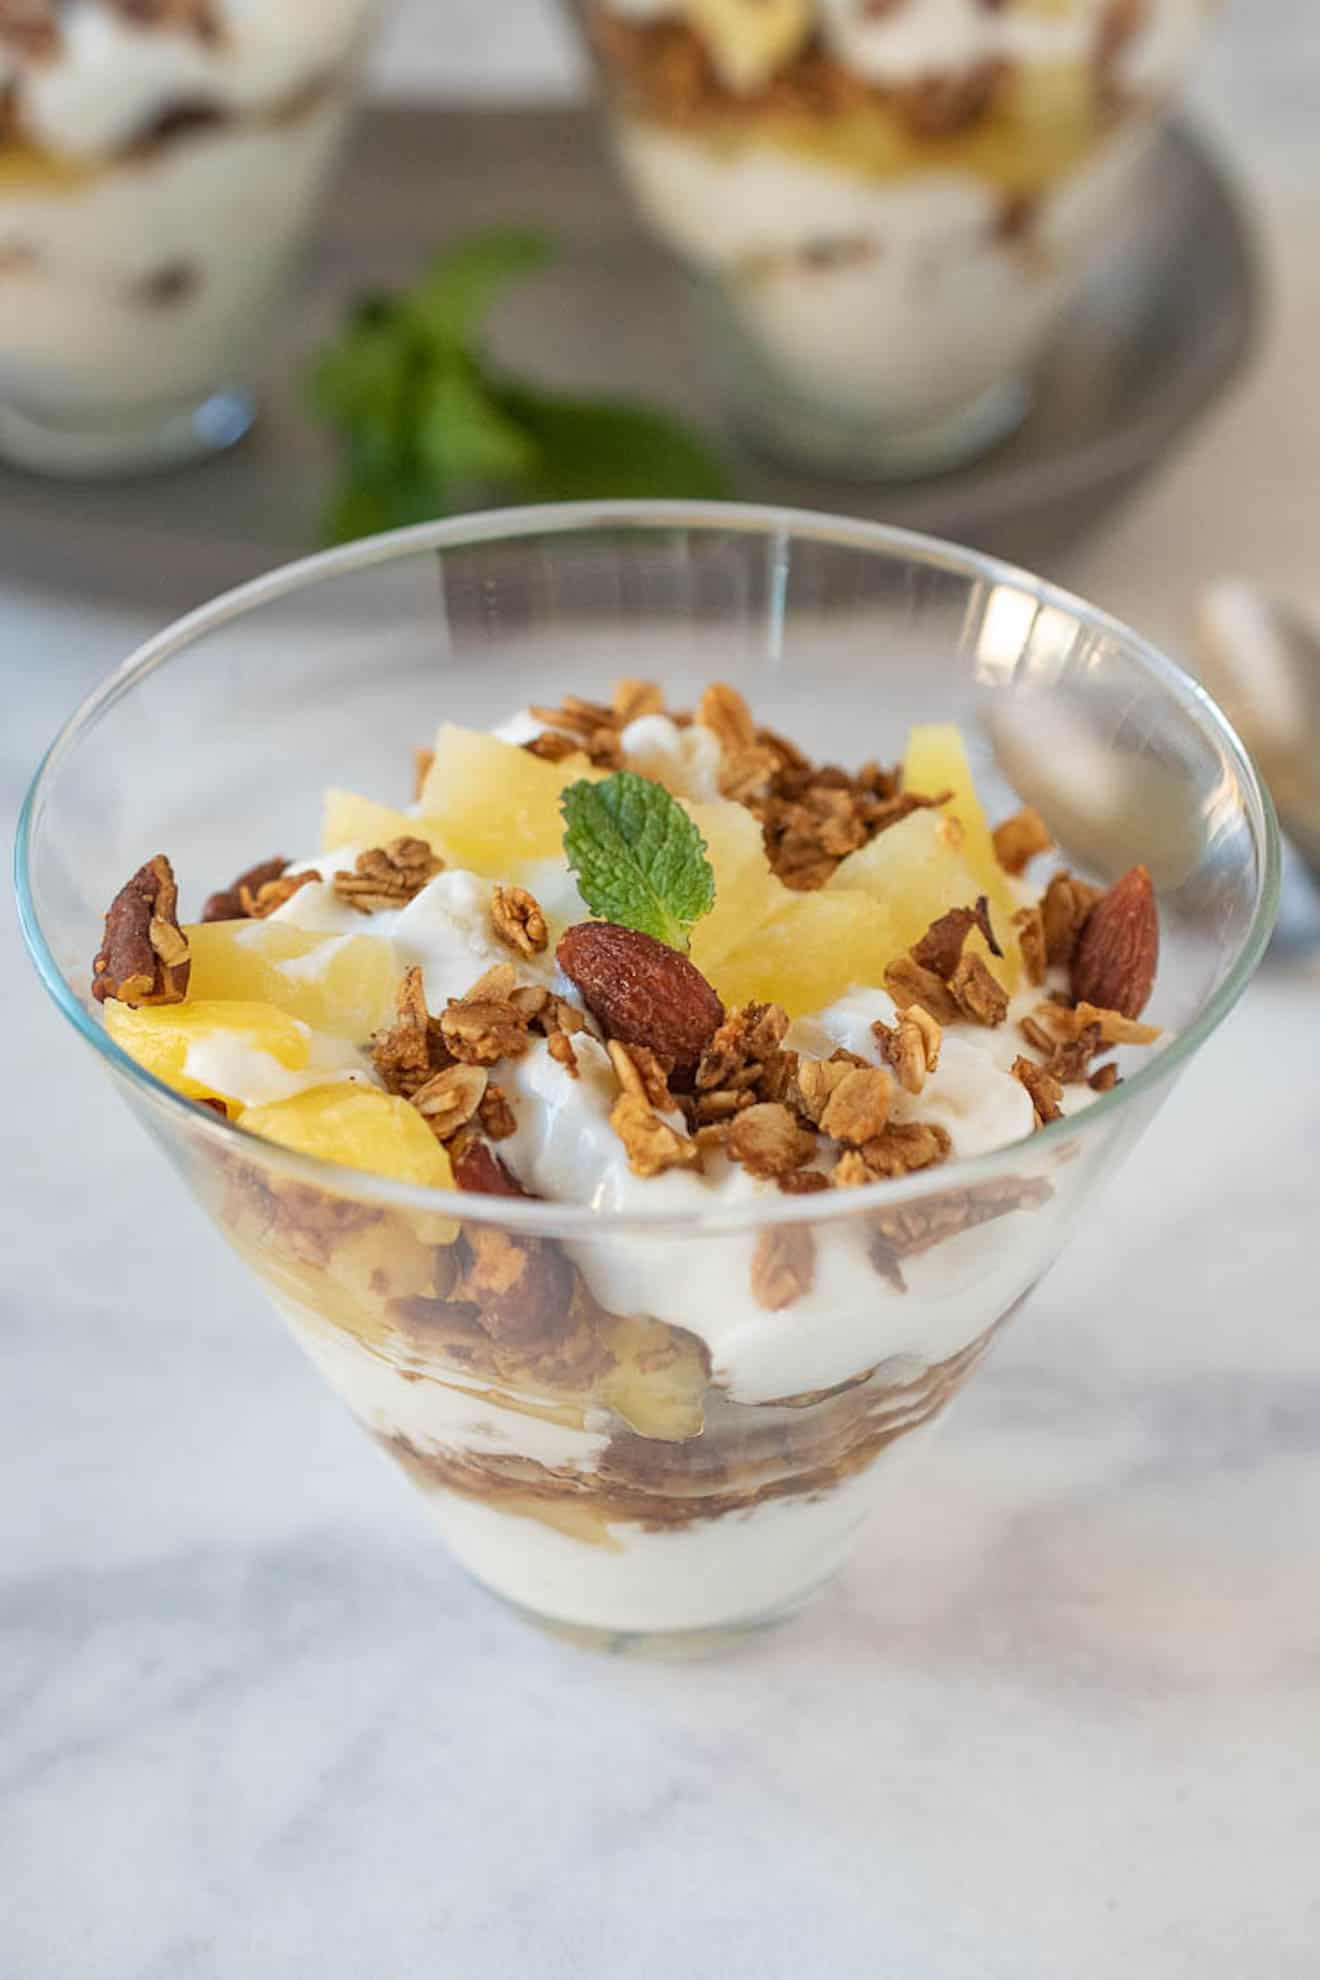 A glass bowl with yogurt, fresh pineapple and granola